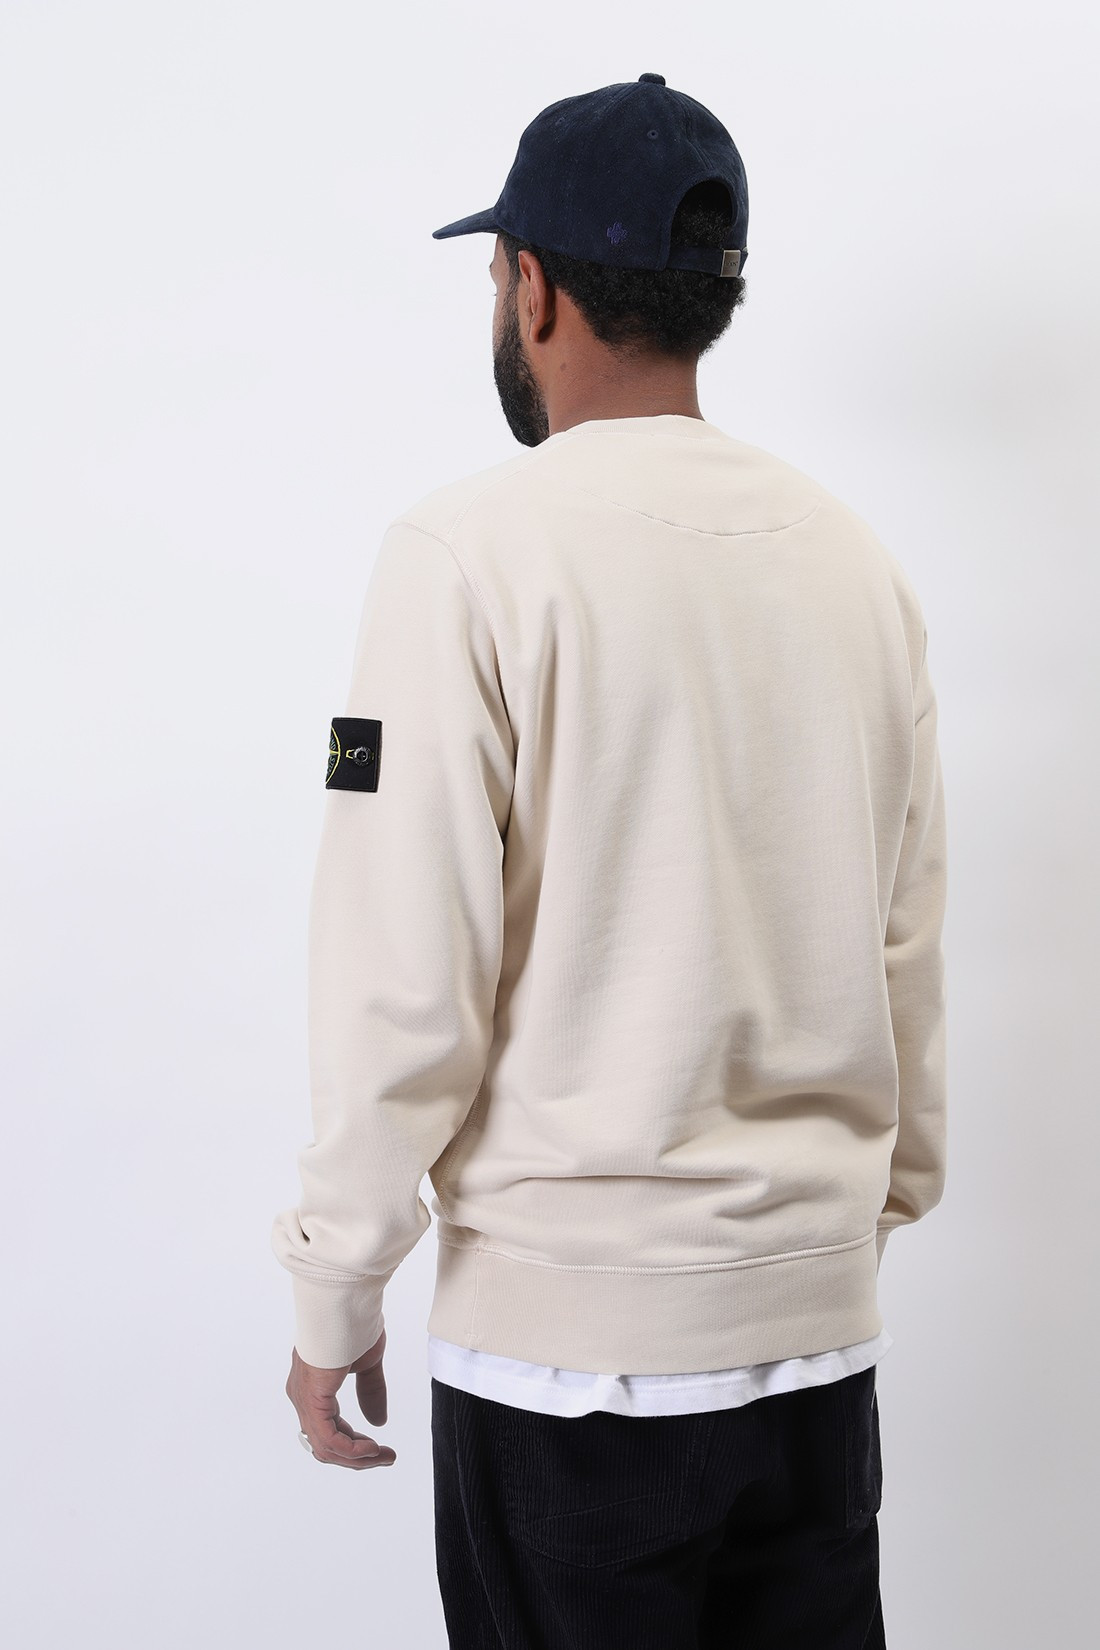 STONE ISLAND / 63051 crewneck sweater v0093 Avorio